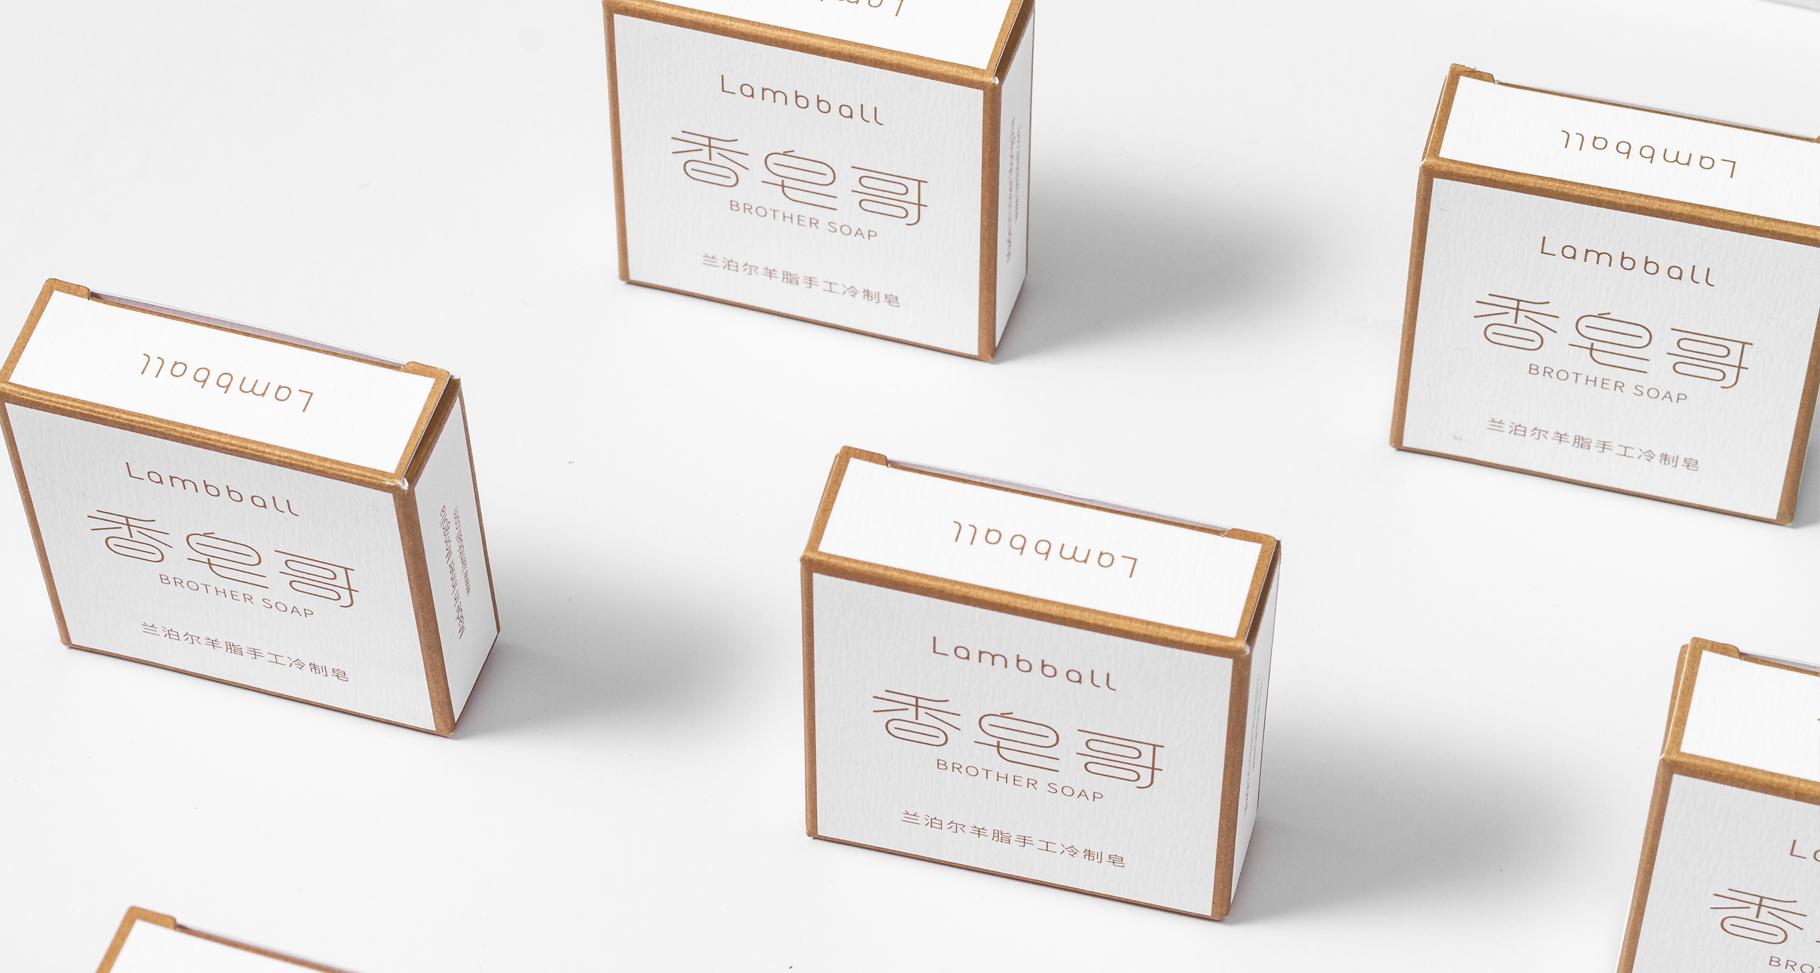 lambball品牌系列产品包装设计 第3张